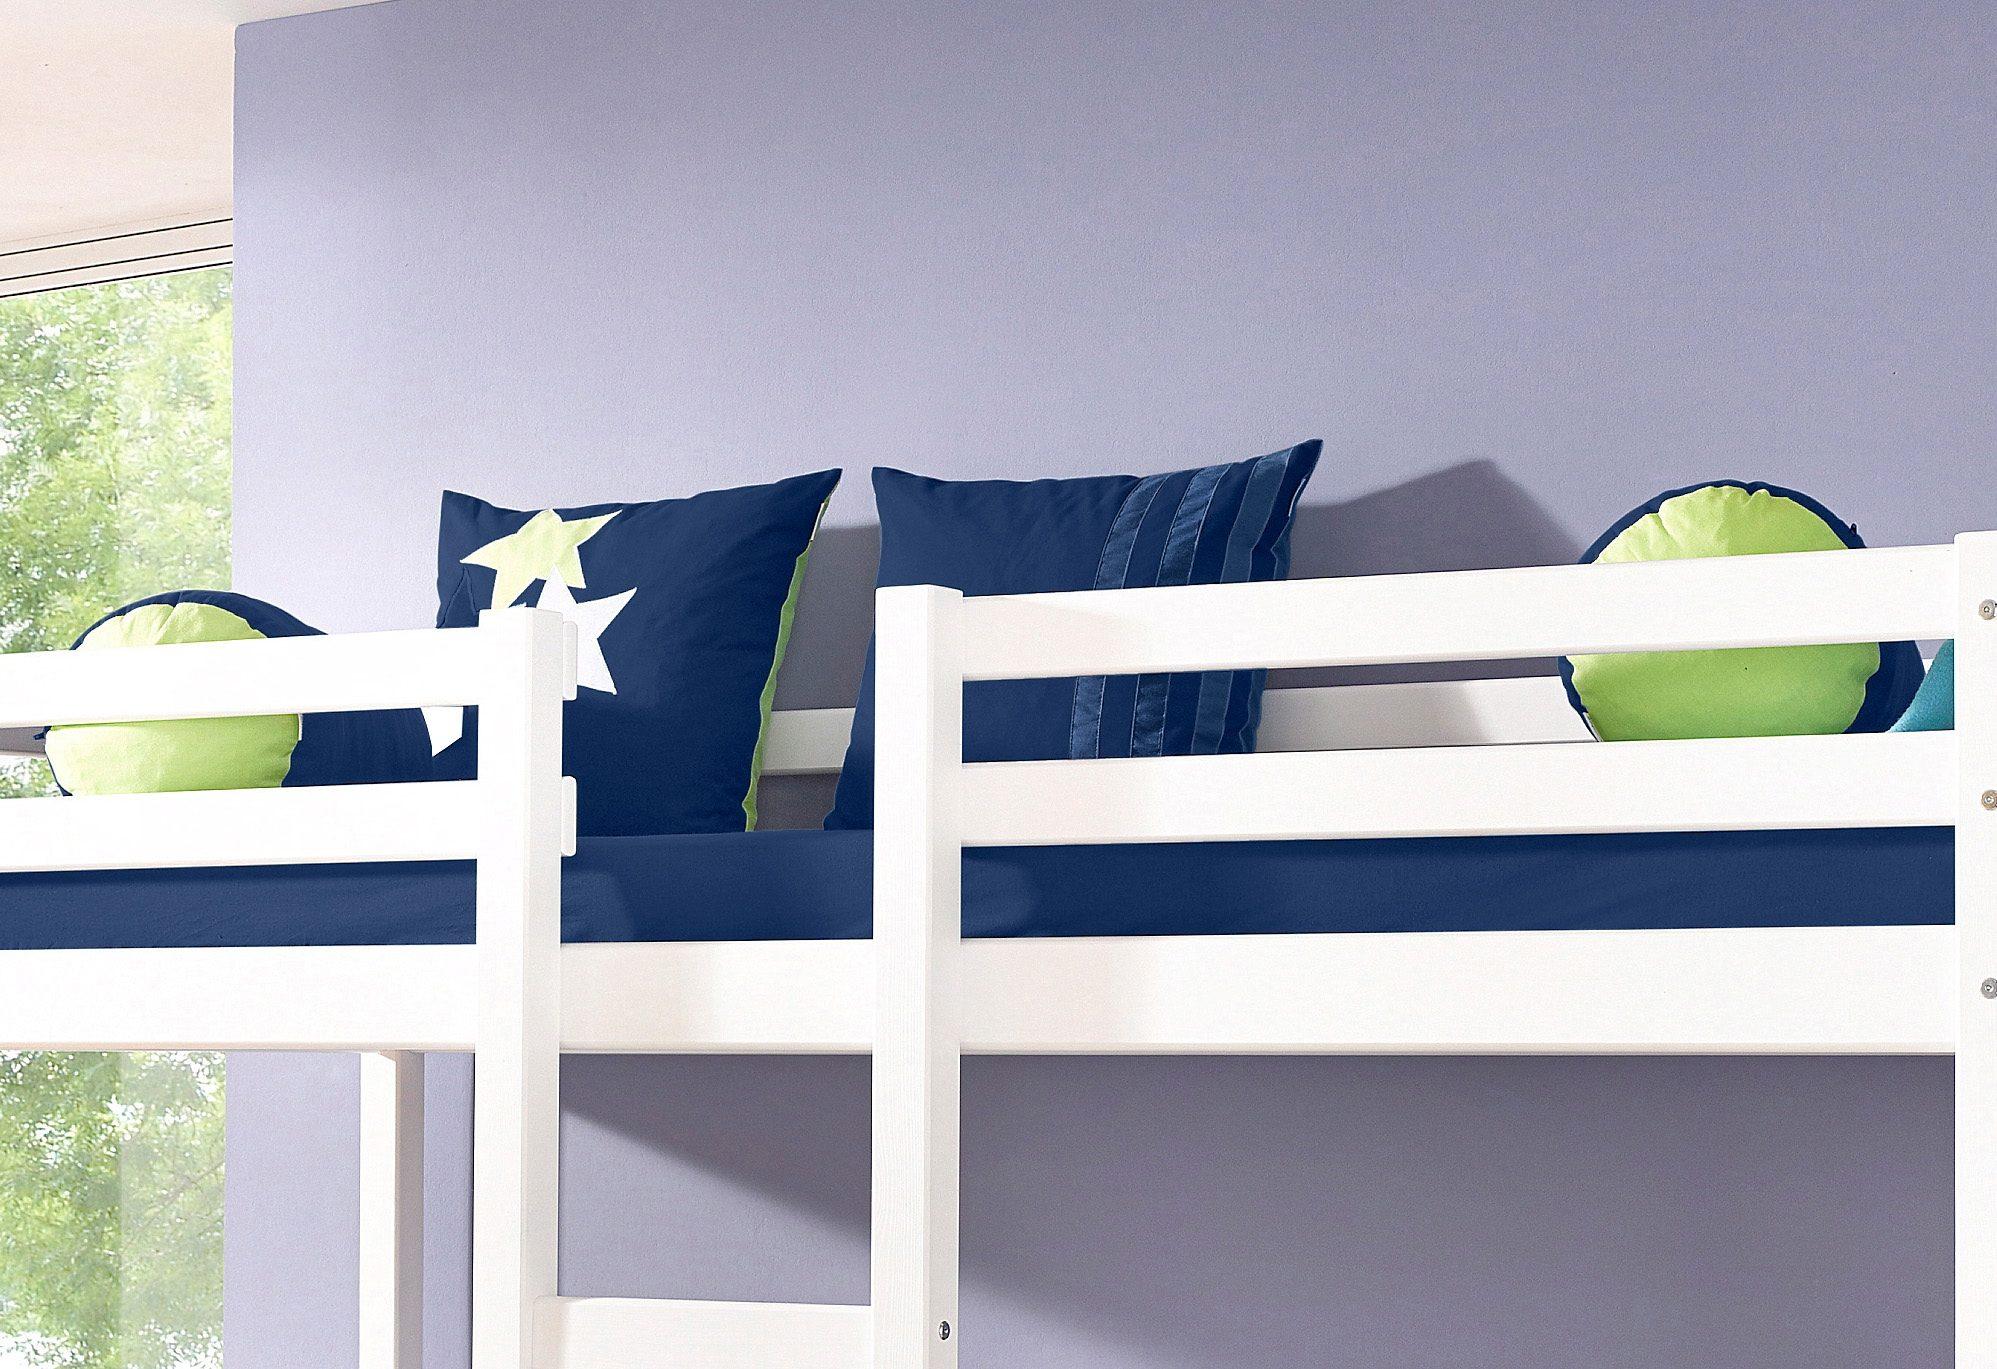 Kissenrollen-Set My Room, Hoppekids (2-tlg.) | Büro > Bürostühle und Sessel  > Bürostühle-Zubehör | HOPPEKIDS